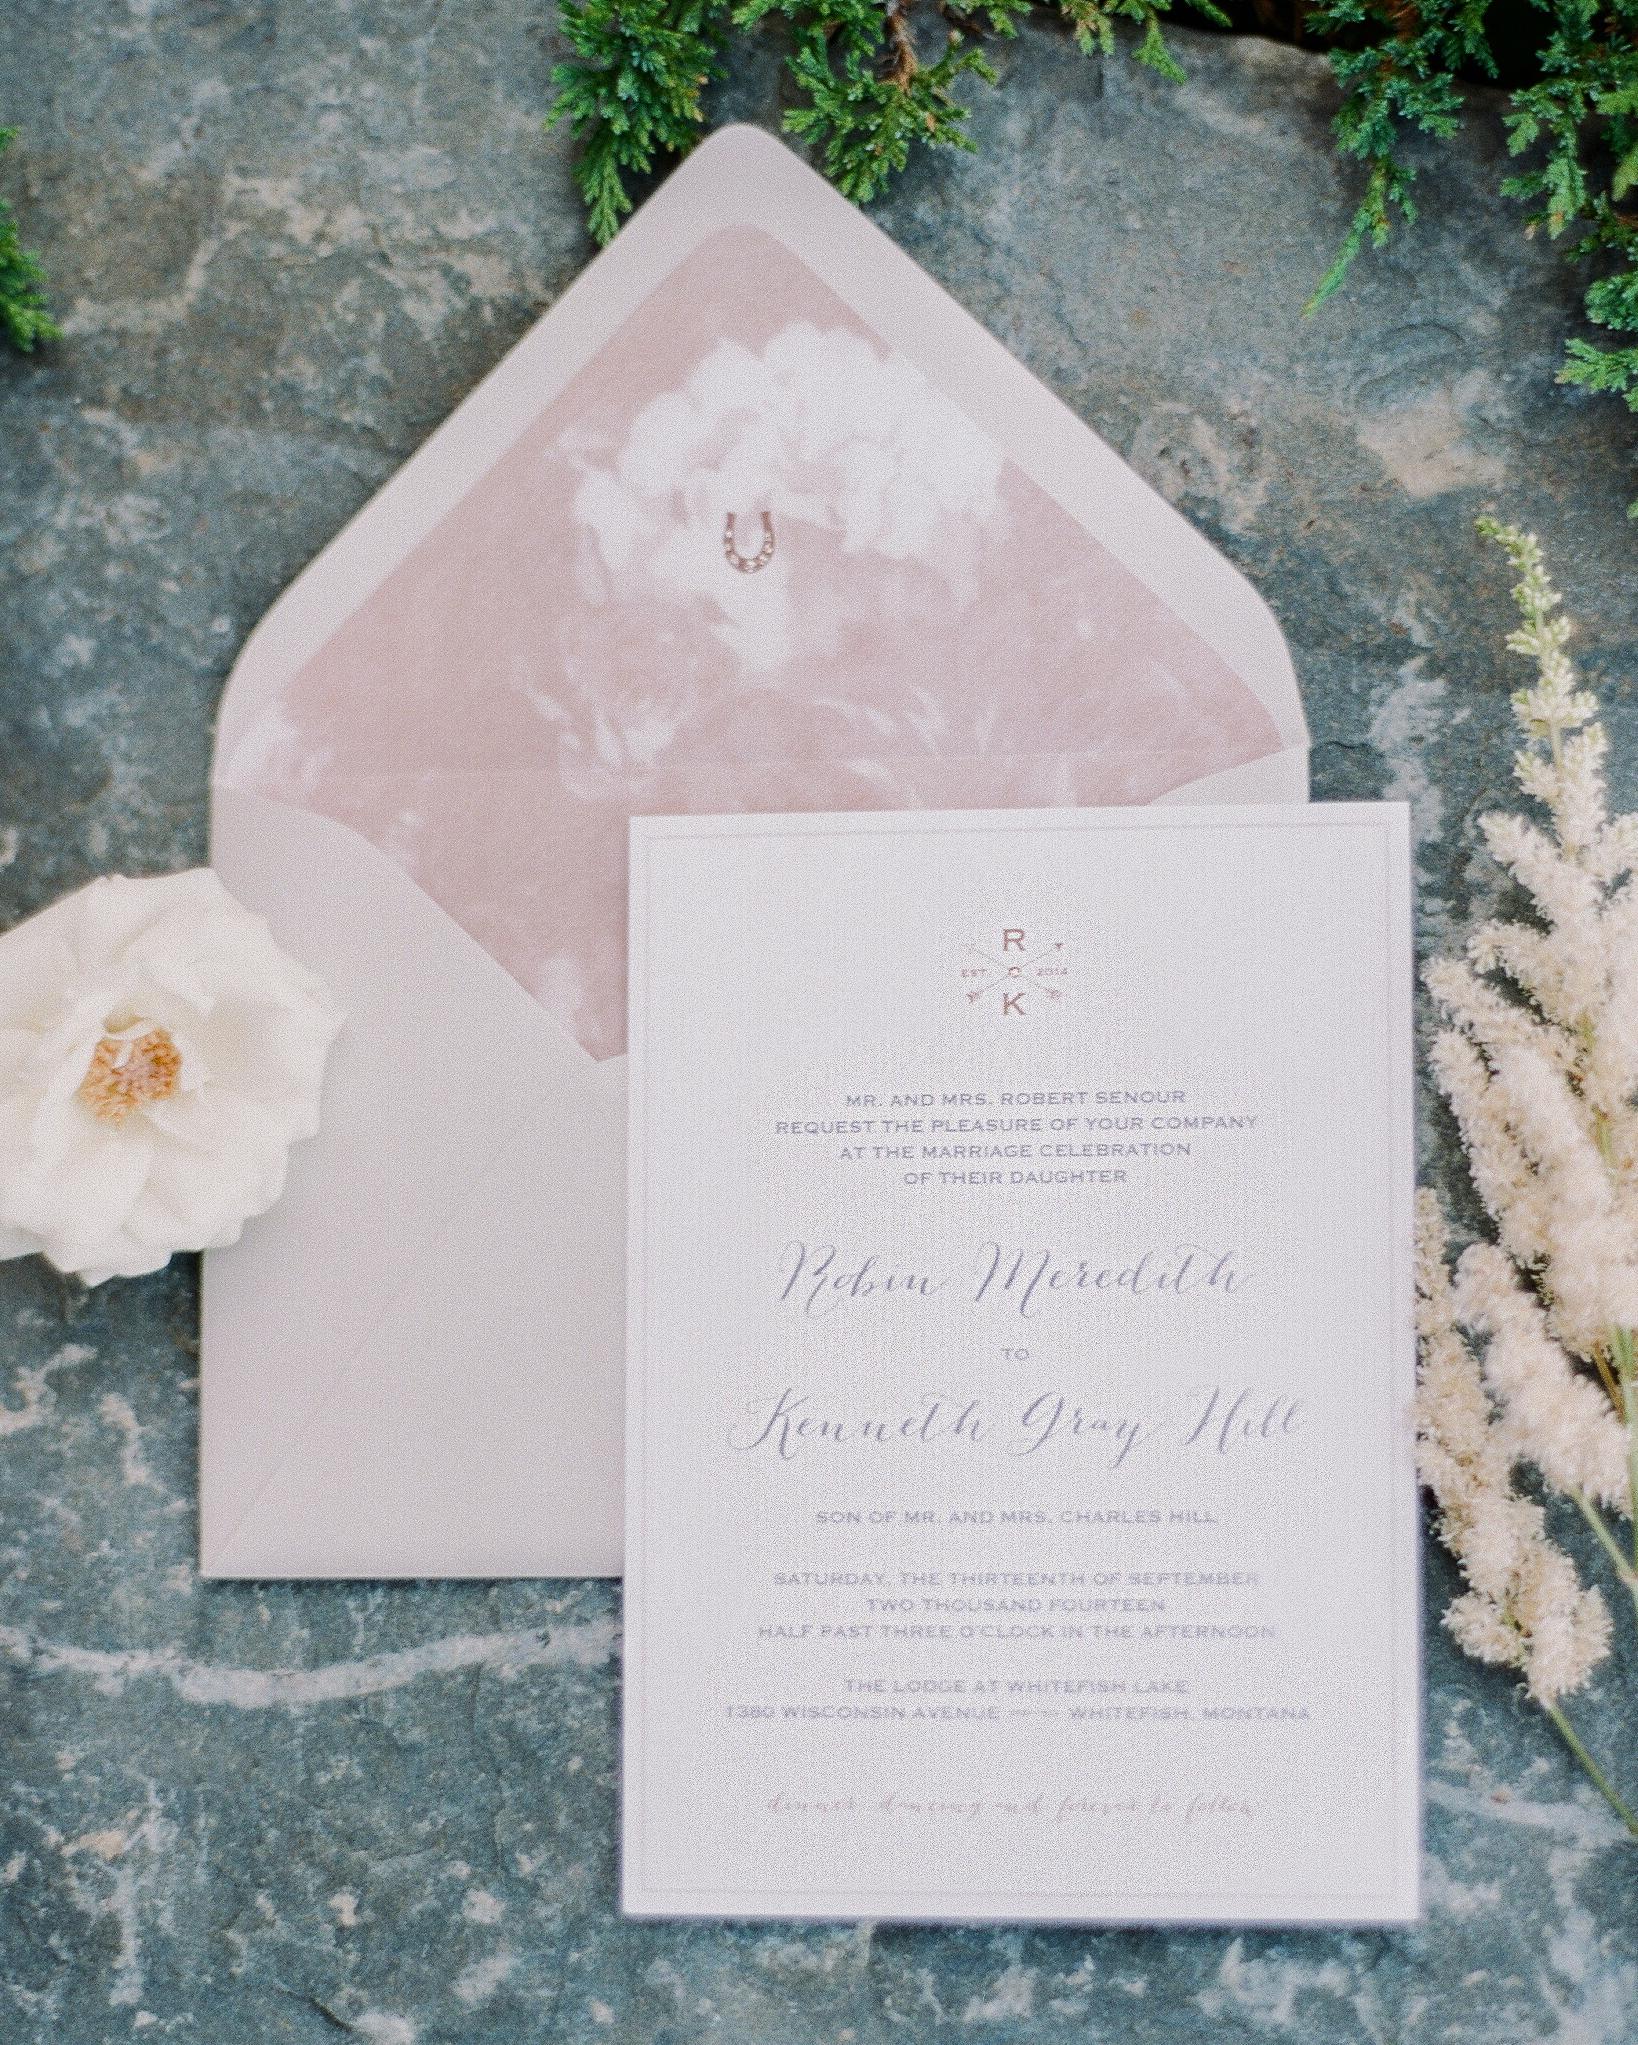 robin-kenny-wedding-invite-042-s112068-0715.jpg